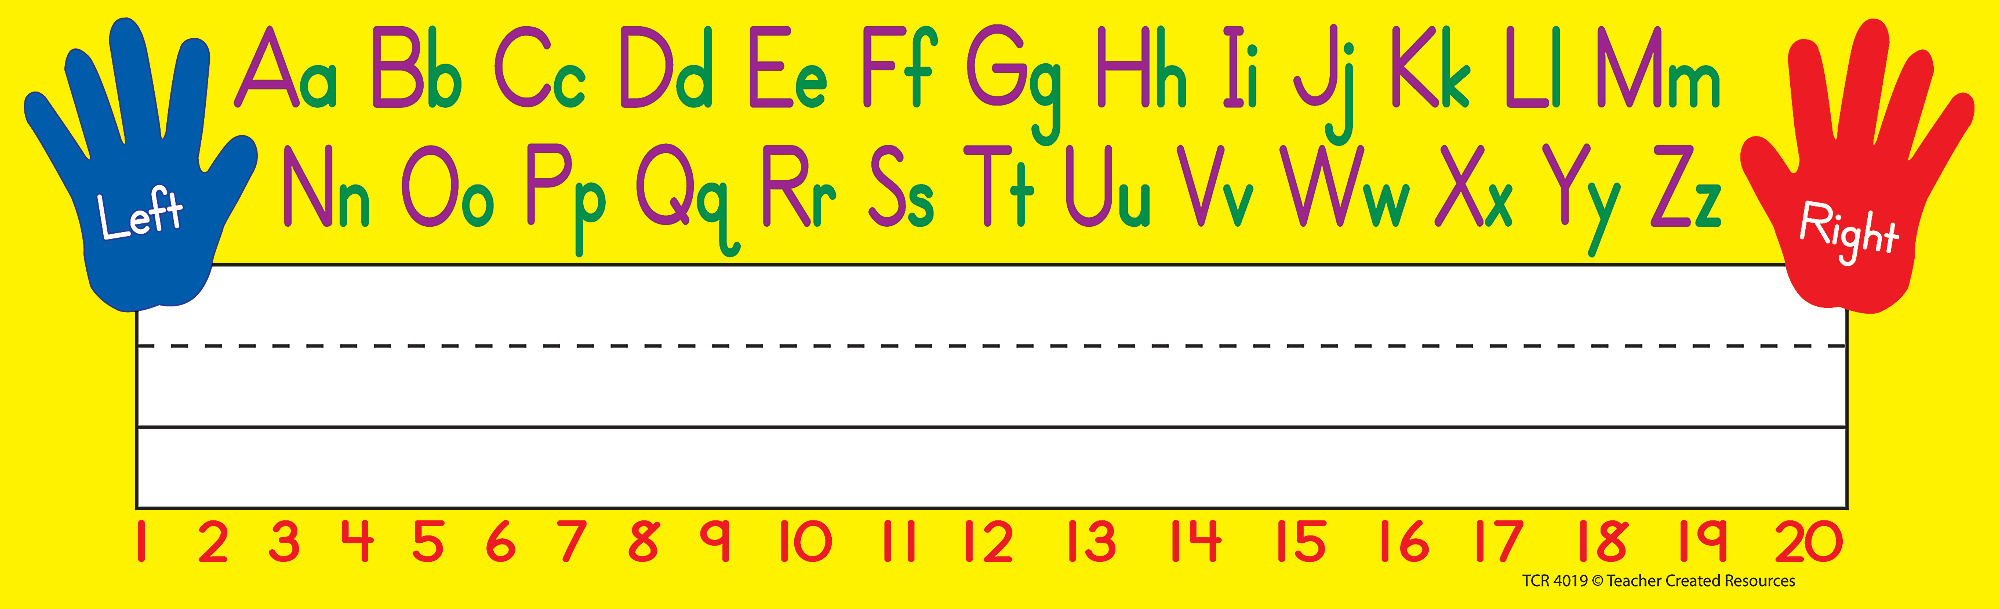 Printable Desk Name Plates For Teachers - Diy Projects - Free Printable Desk Name Plates For Students